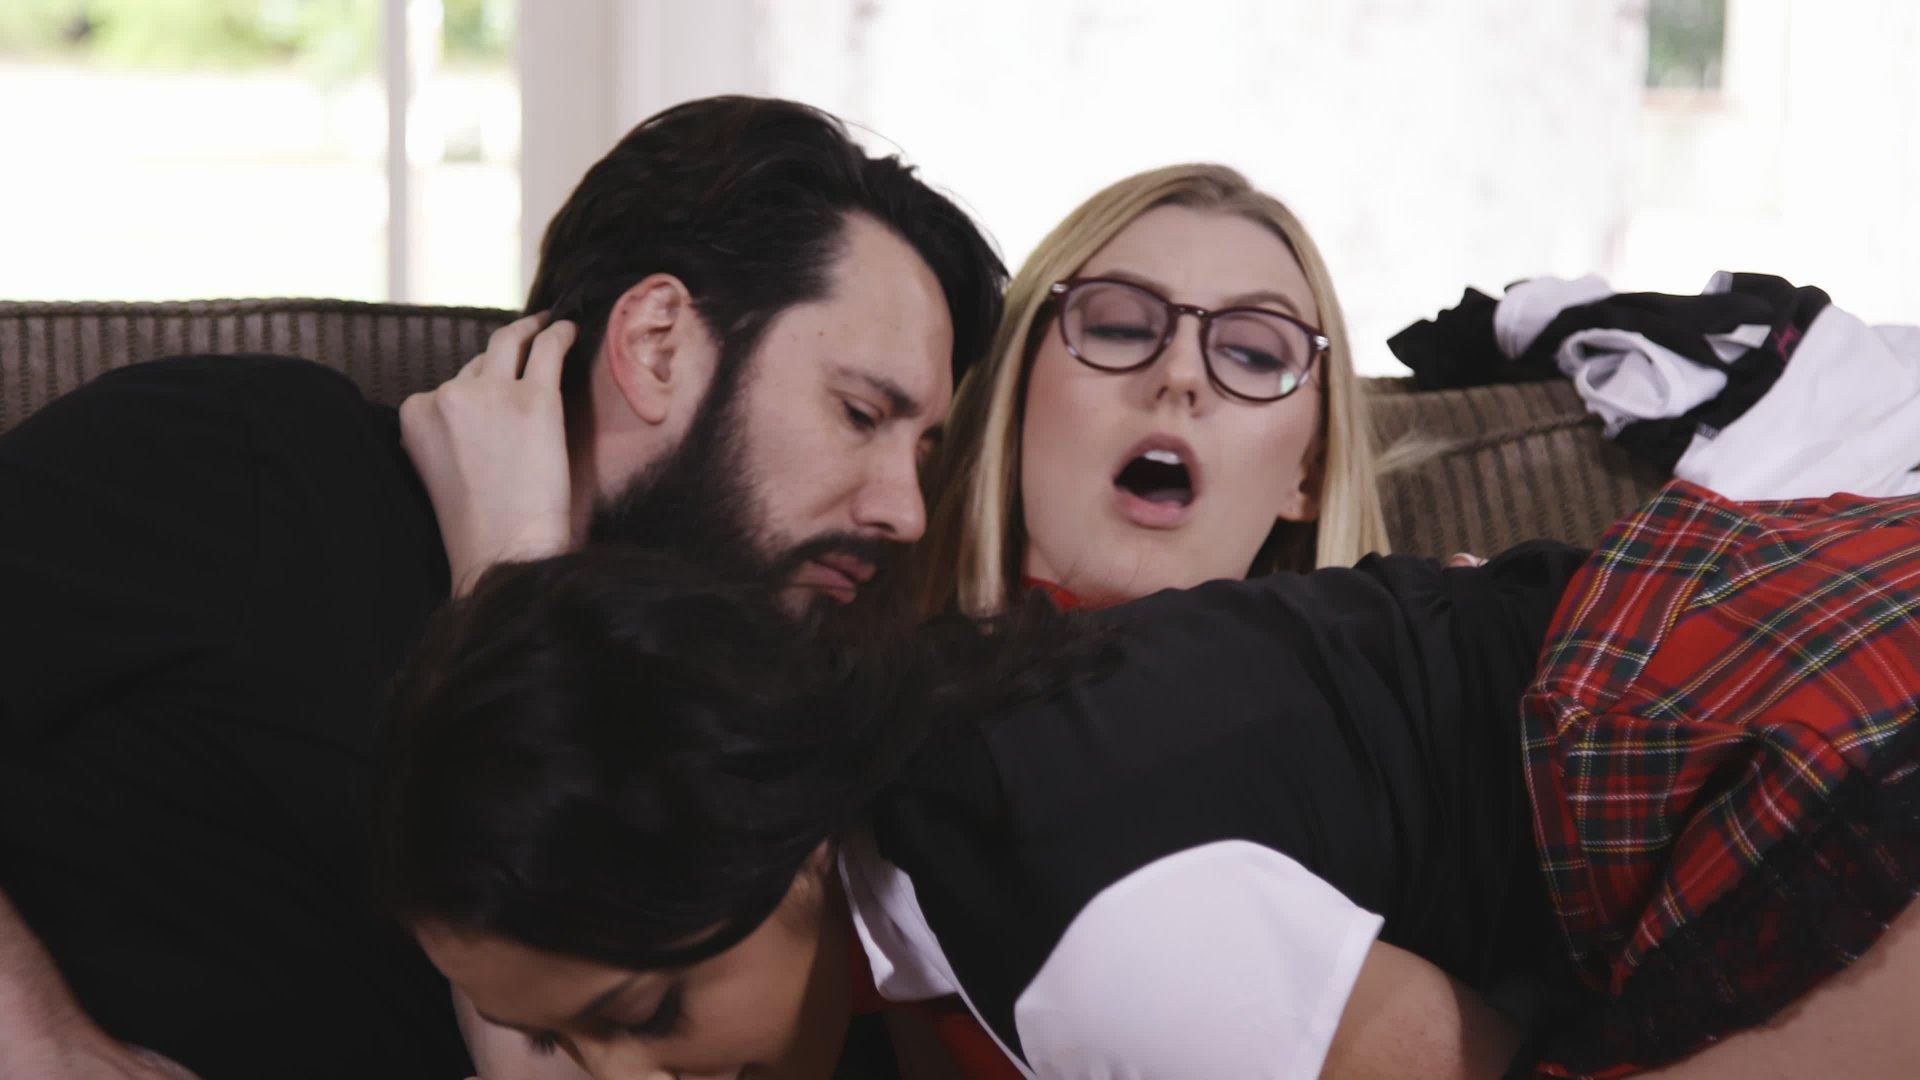 Silicone freee threesome avi movies